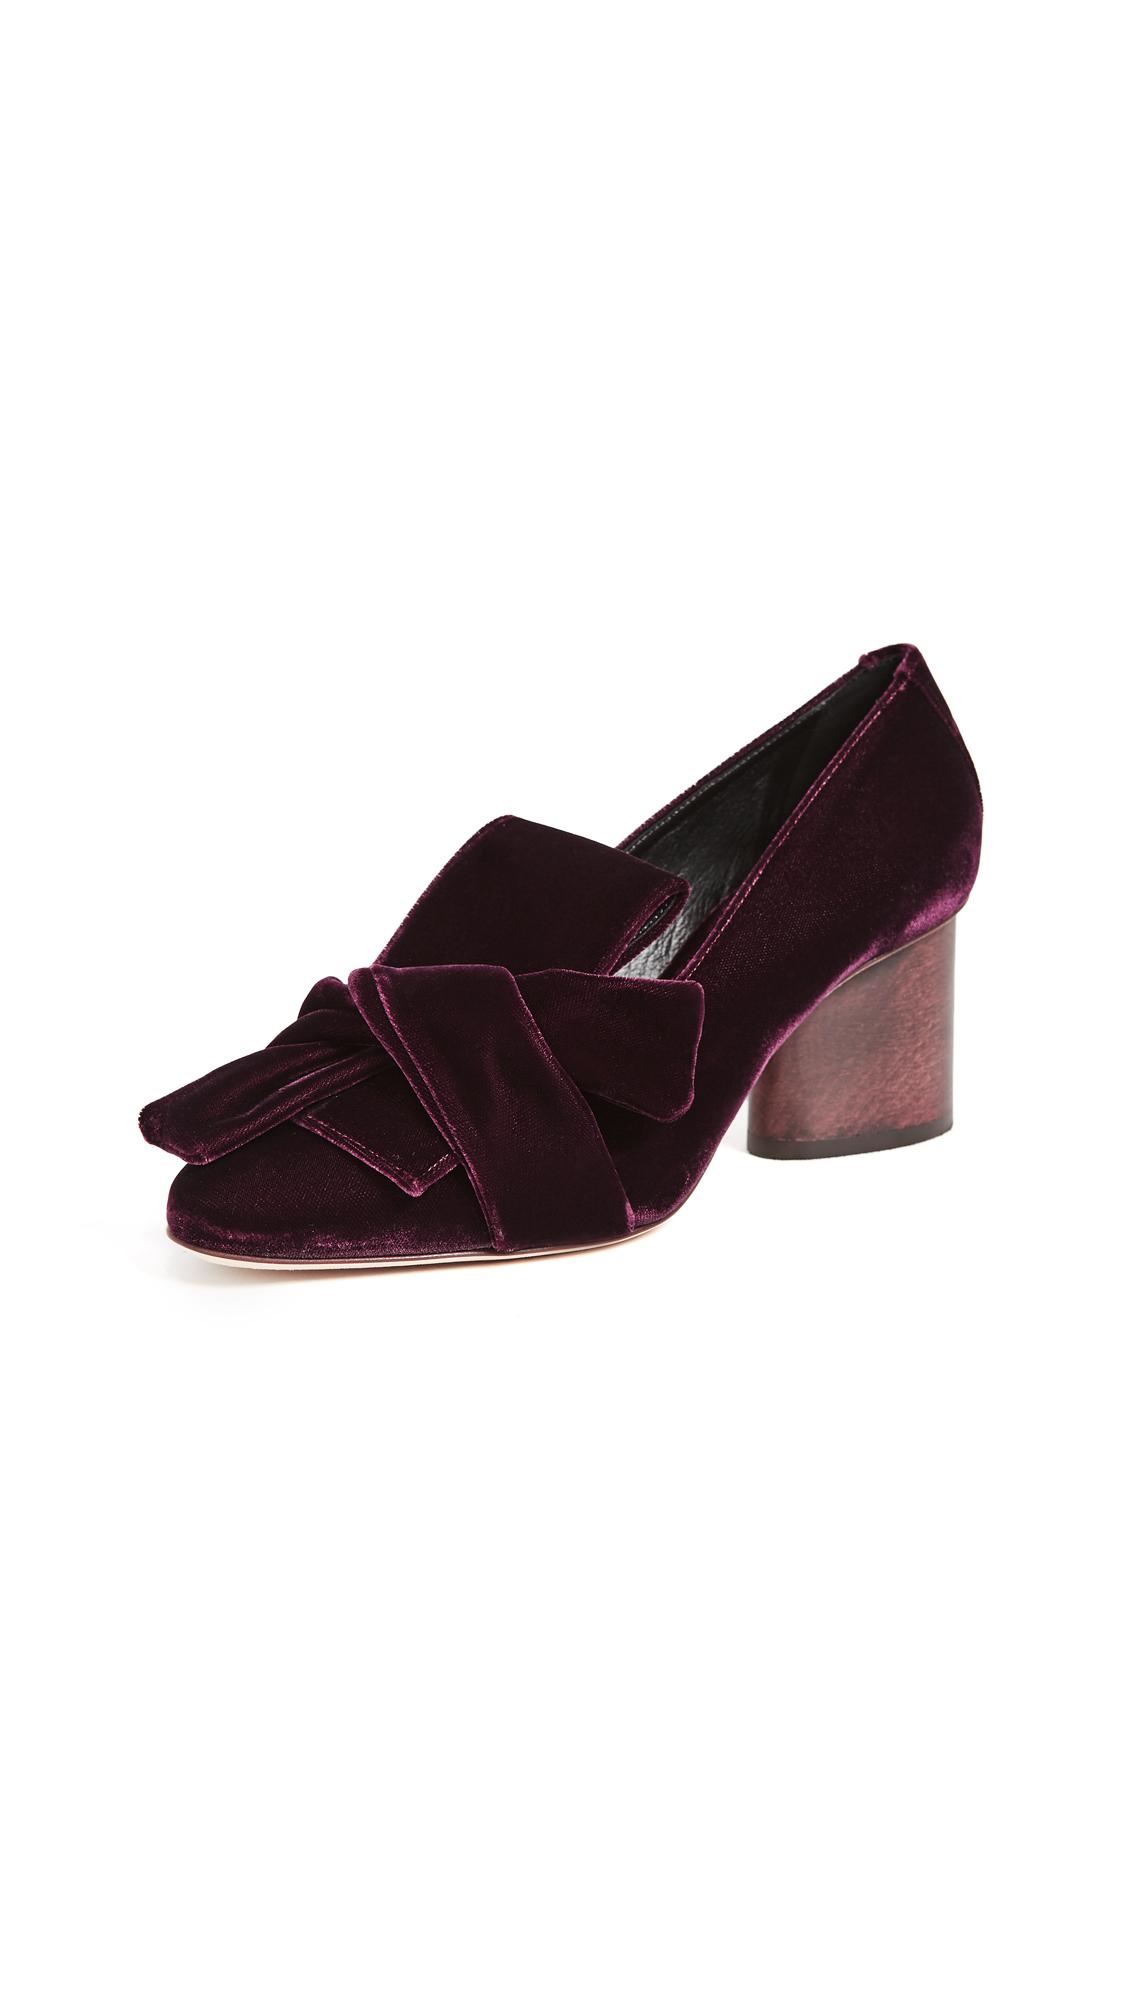 Zero + Maria Cornejo Sofilane Block Heel Pumps - Merlot